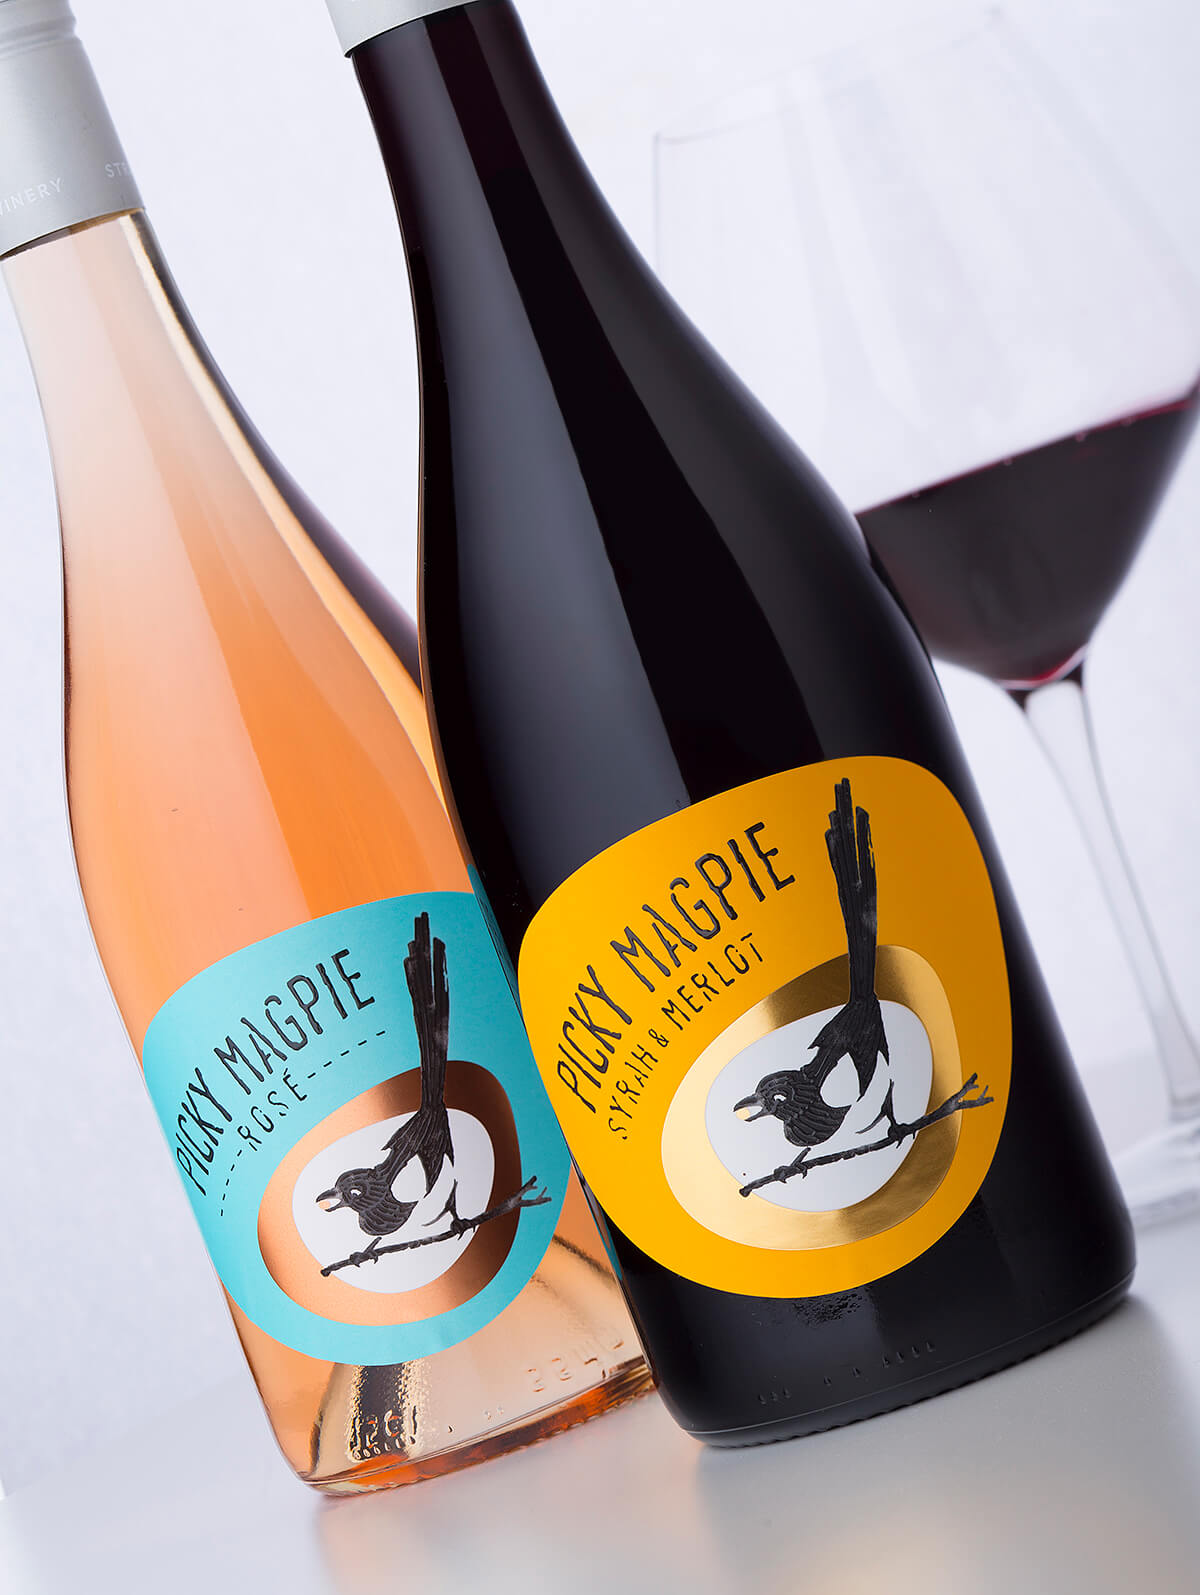 Picky Magpie - Wine Brand